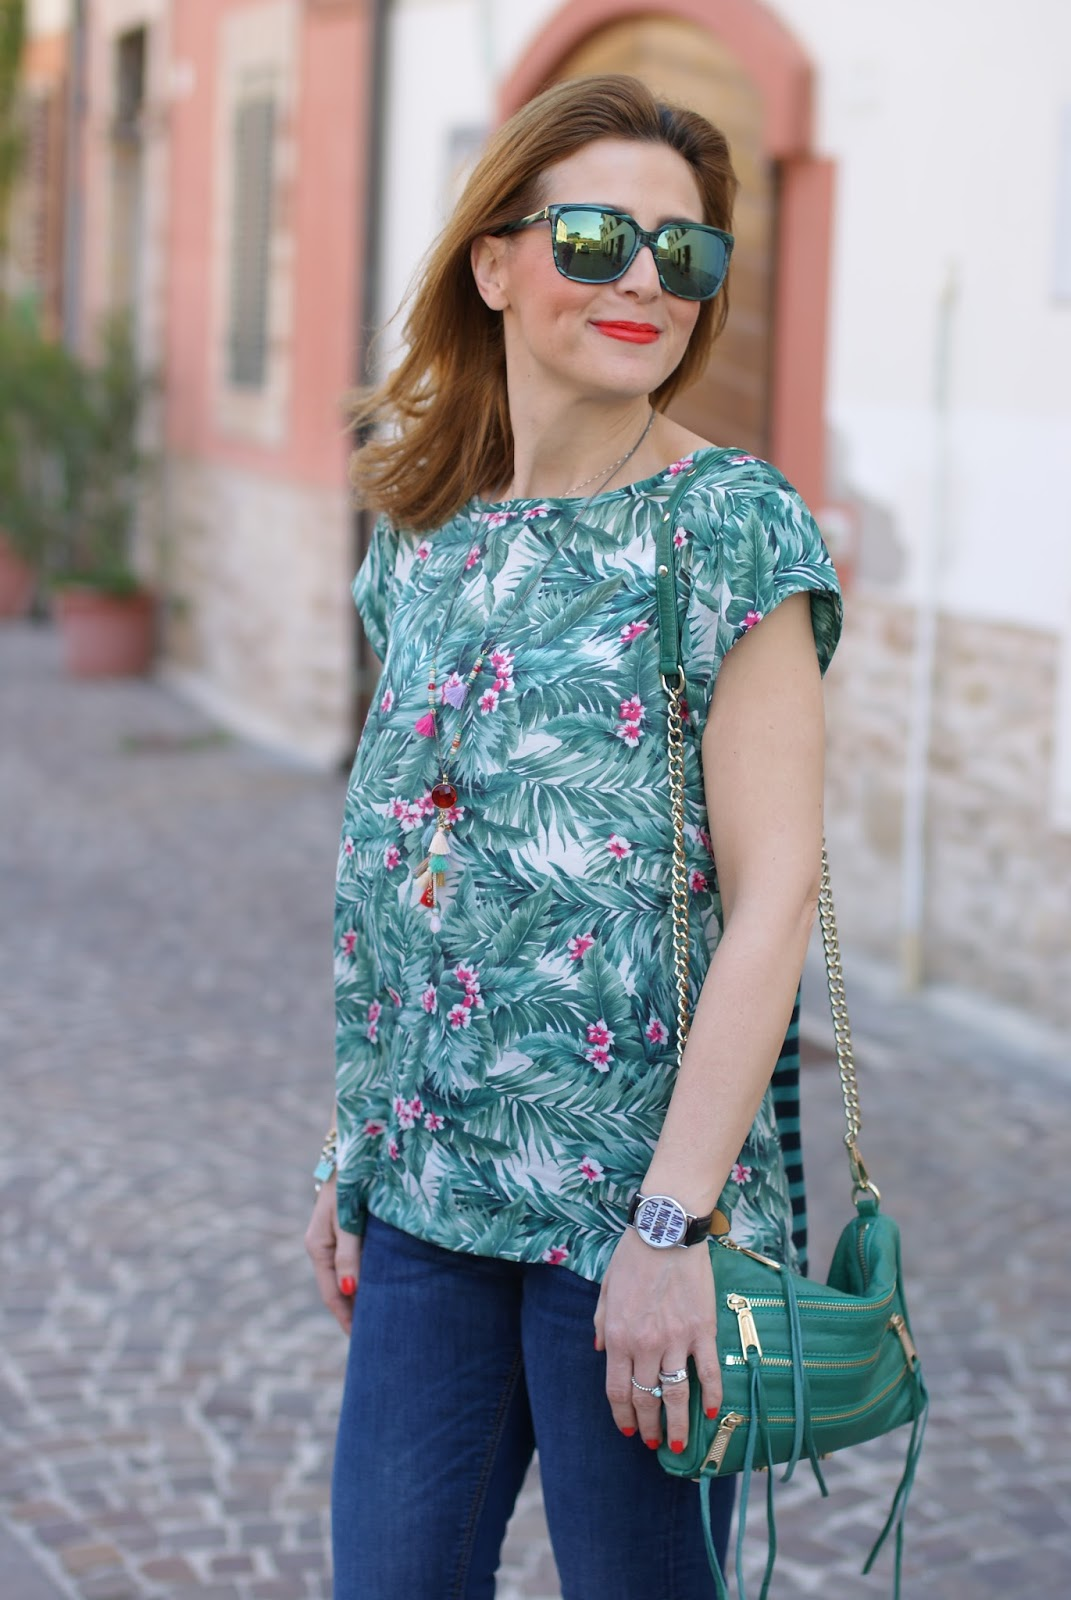 Hype Glass sunglasses and Mismash Askani t-shirt on Fashion and Cookies fashion blog, fashion blogger style